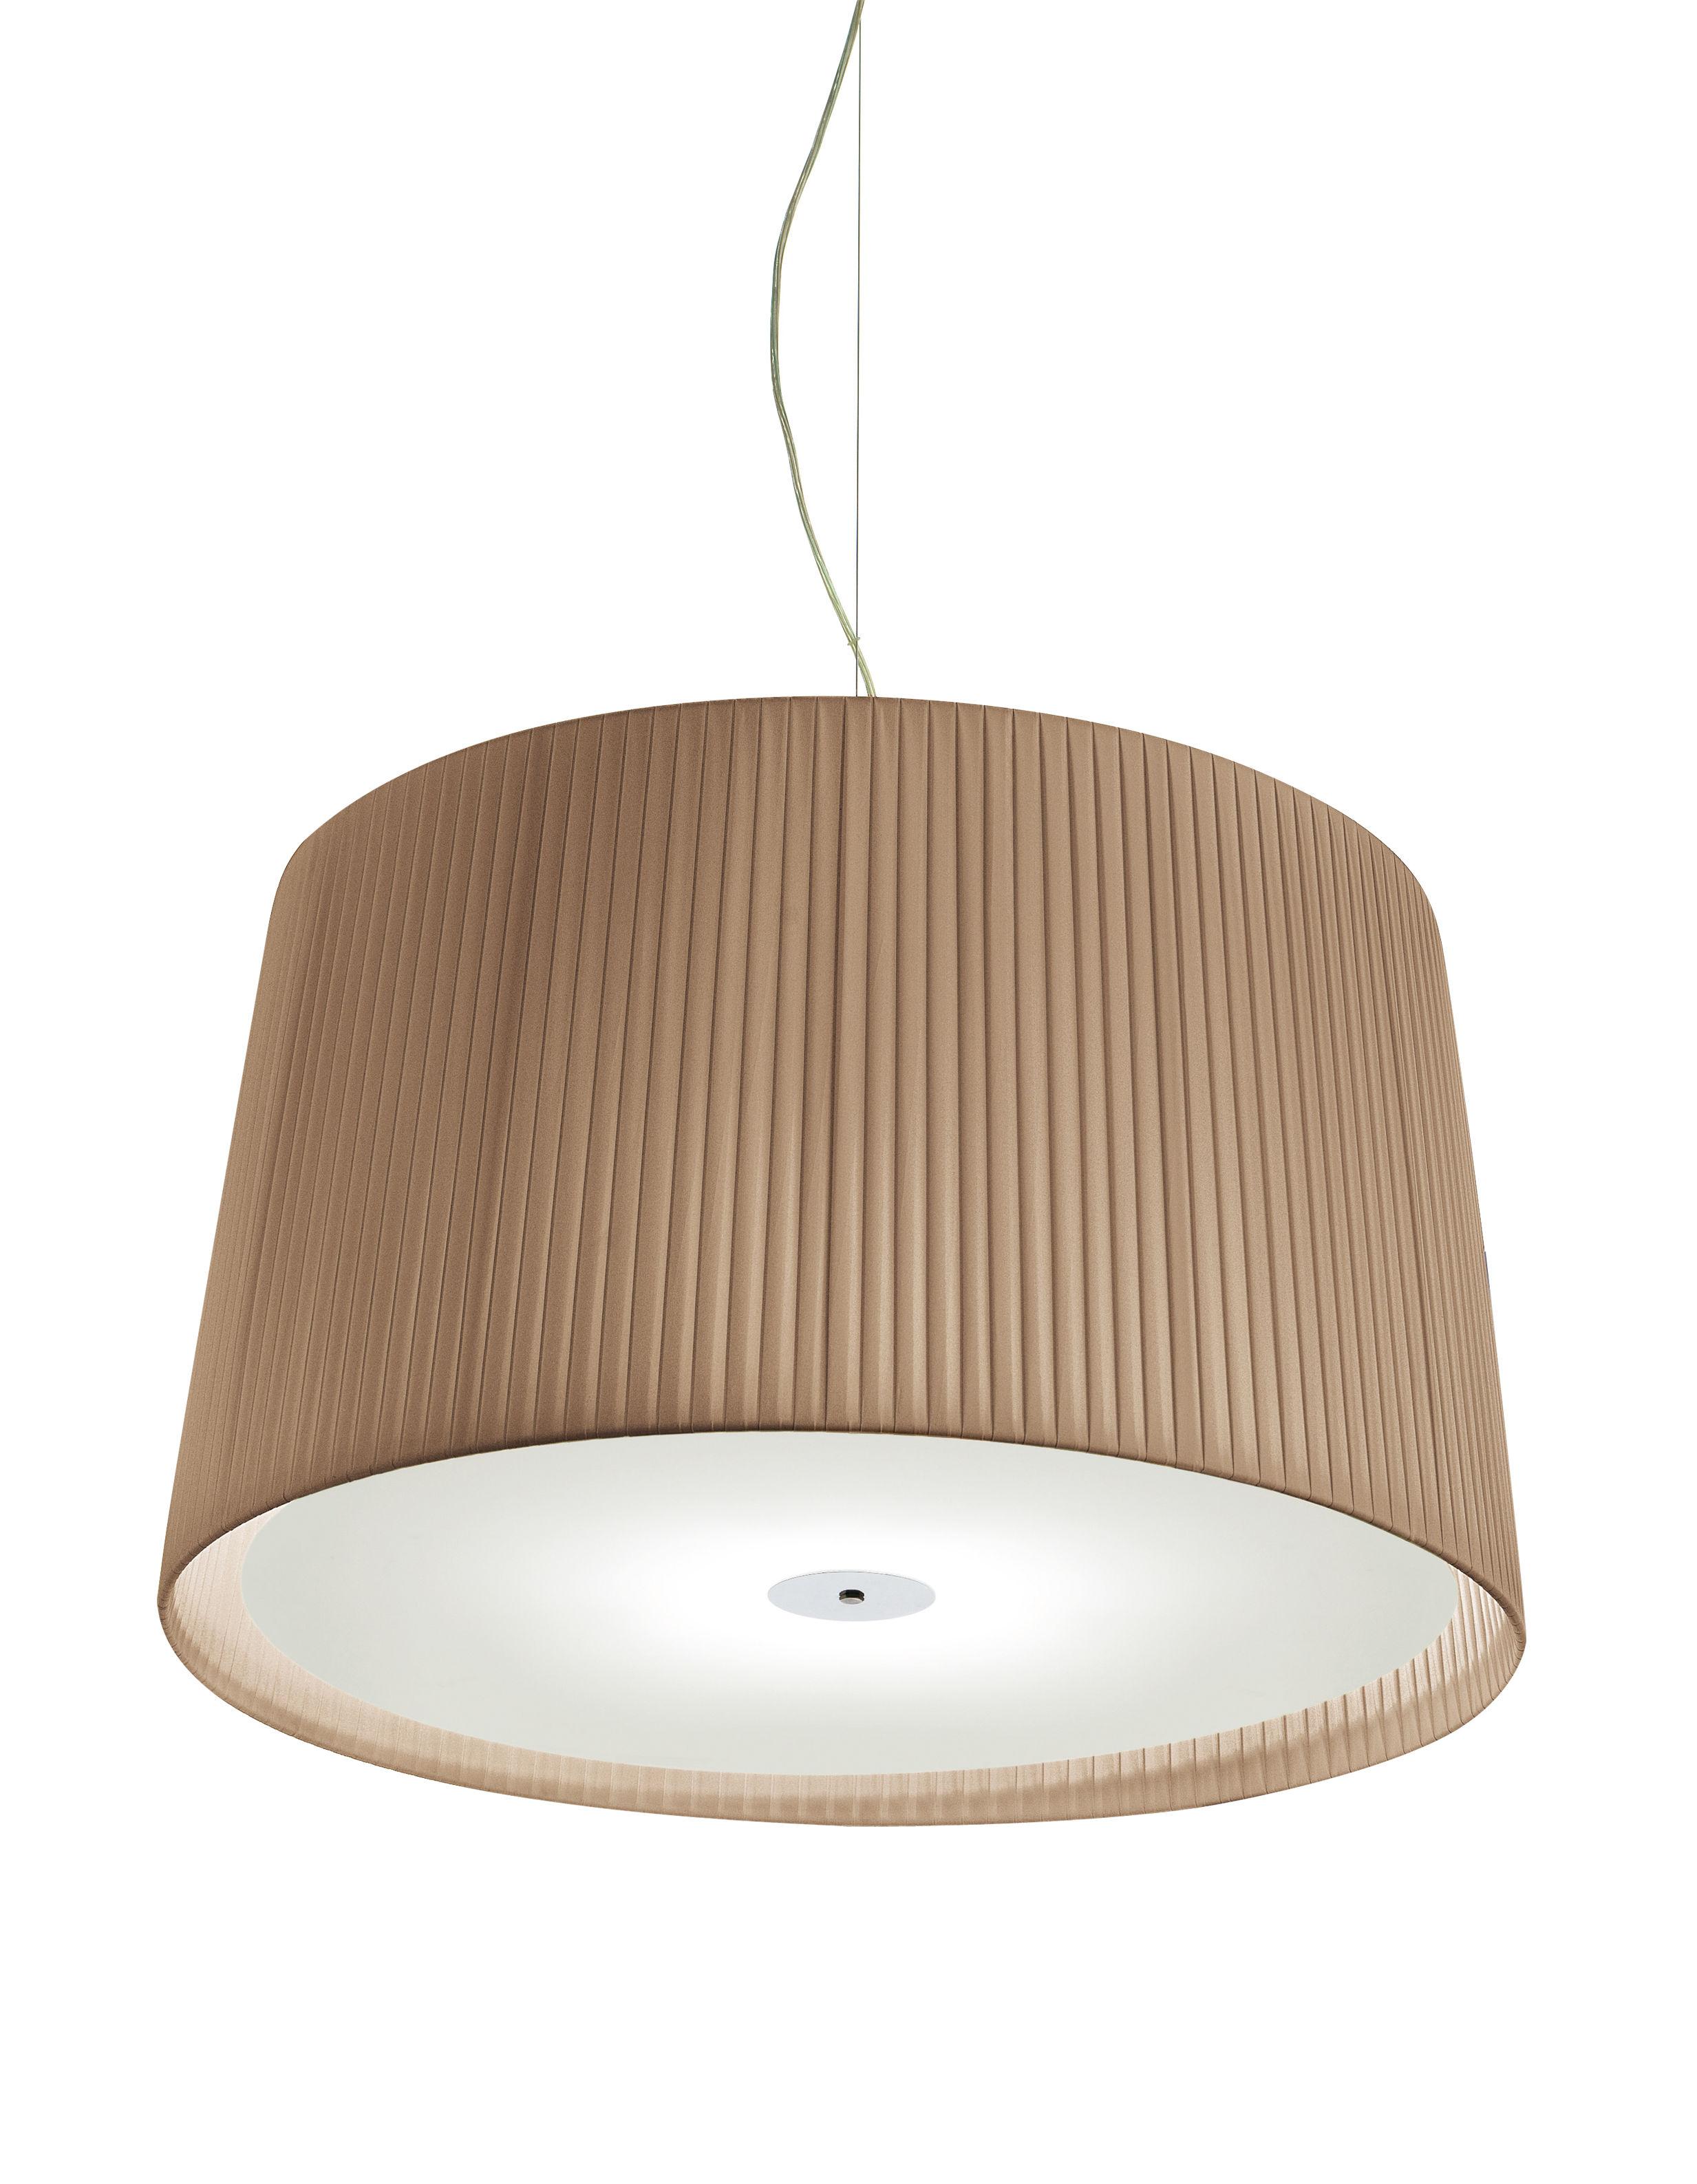 Lighting - Pendant Lighting - Milleluci Pendant - / Ø 40 cm by Modoluce - Dark Beige - Cotton, Plexiglas